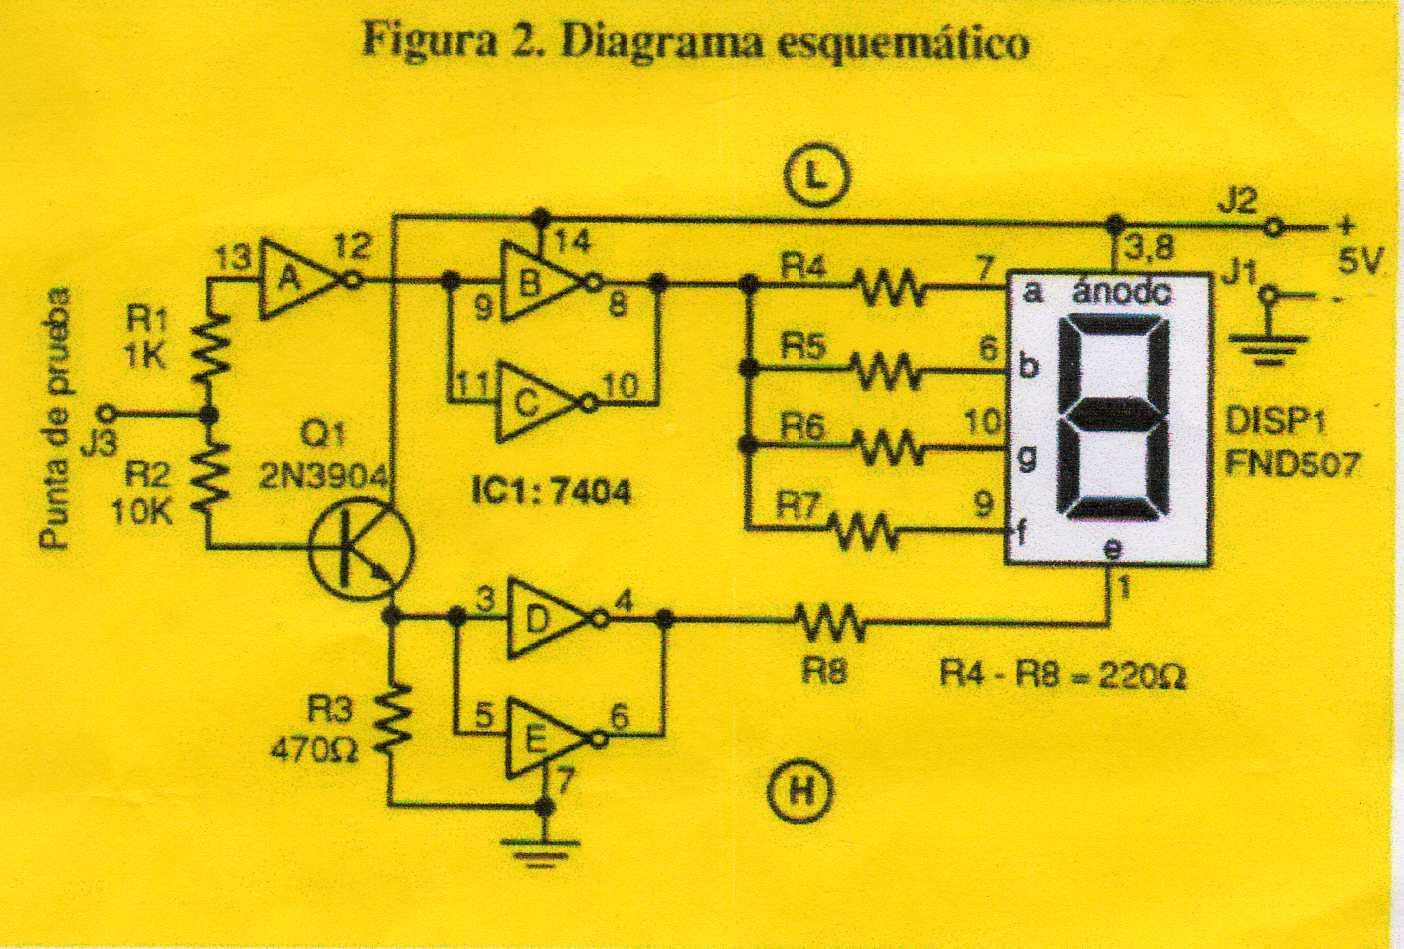 Circuito Logico : Ejercicio circuito combinacional c c